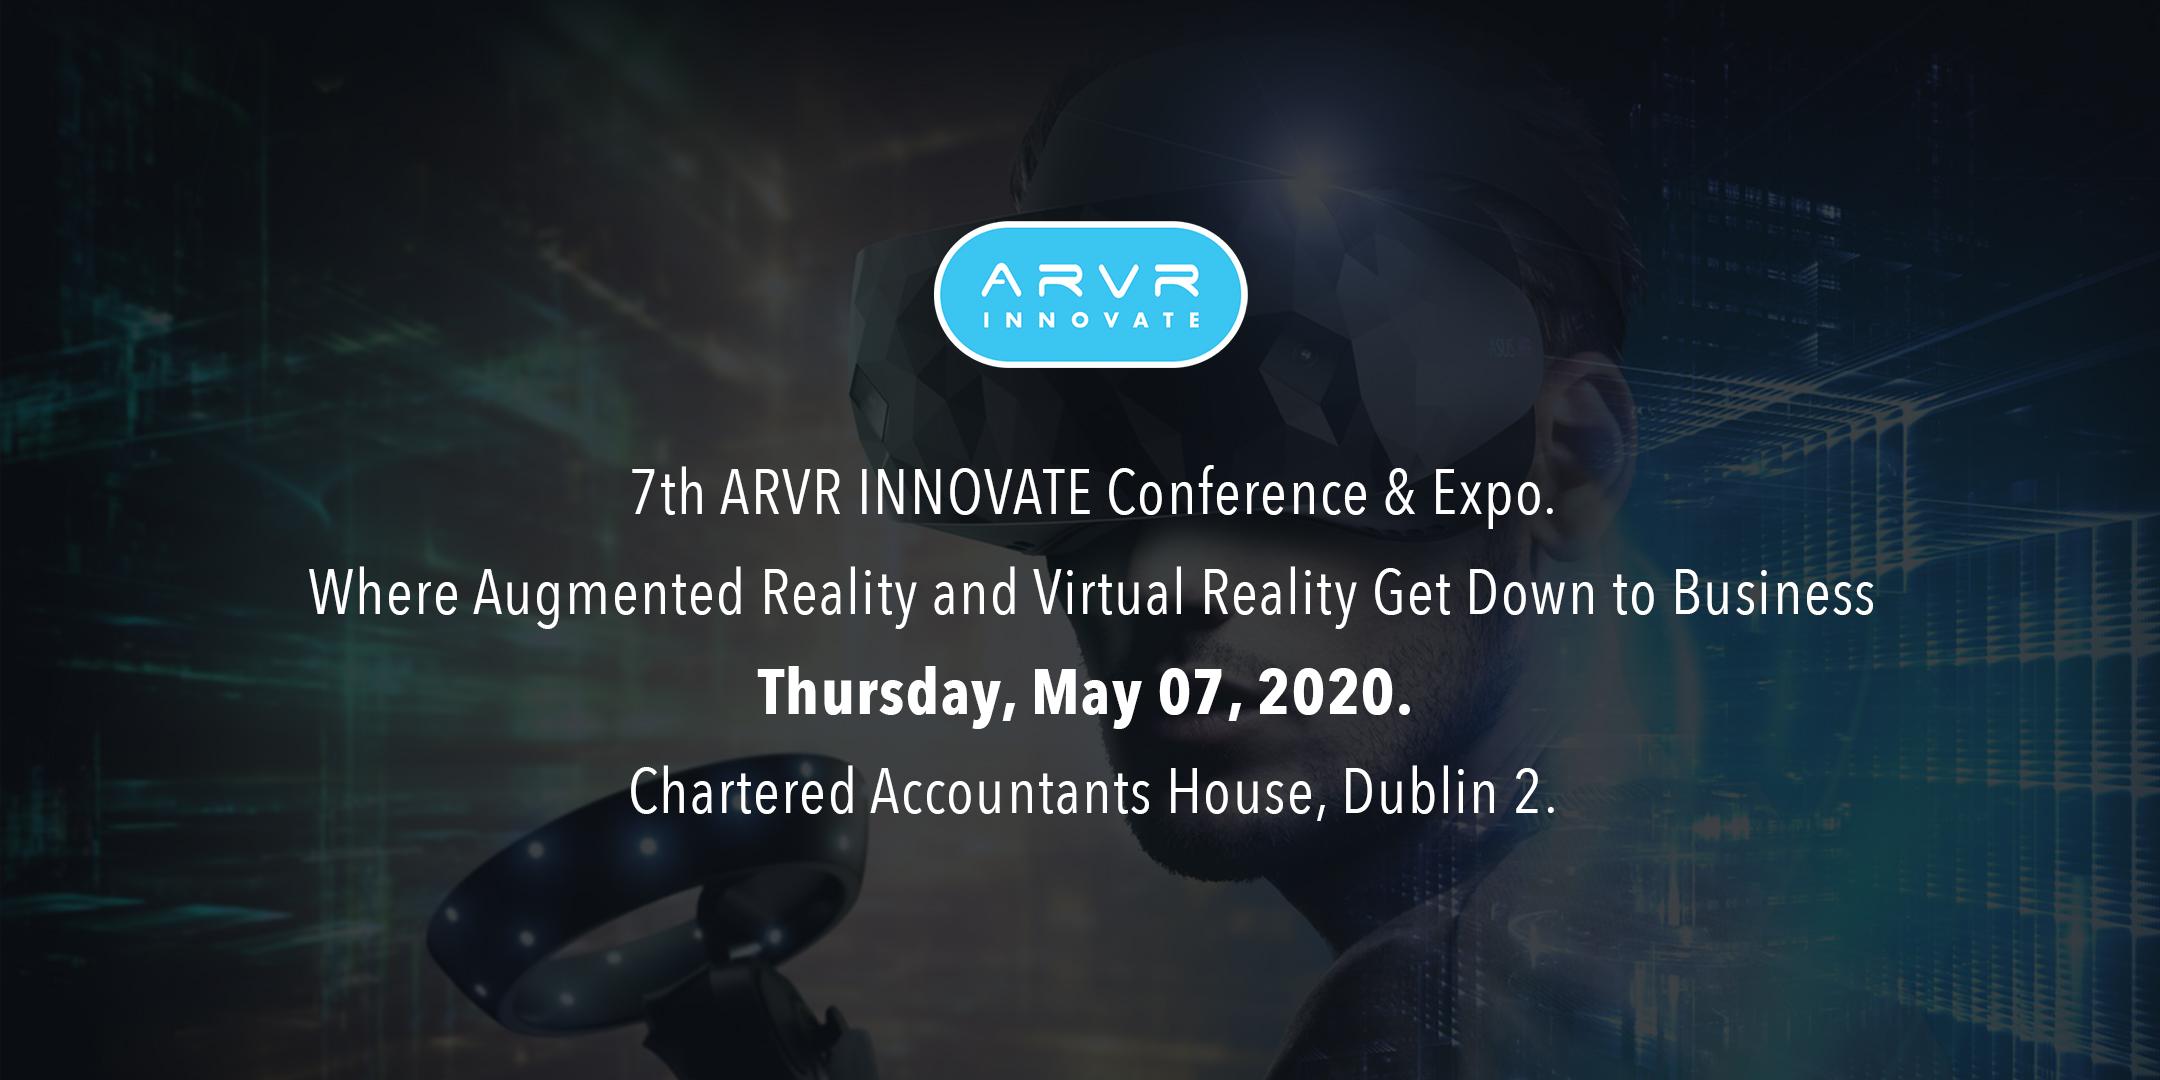 ARVR Innovate event details